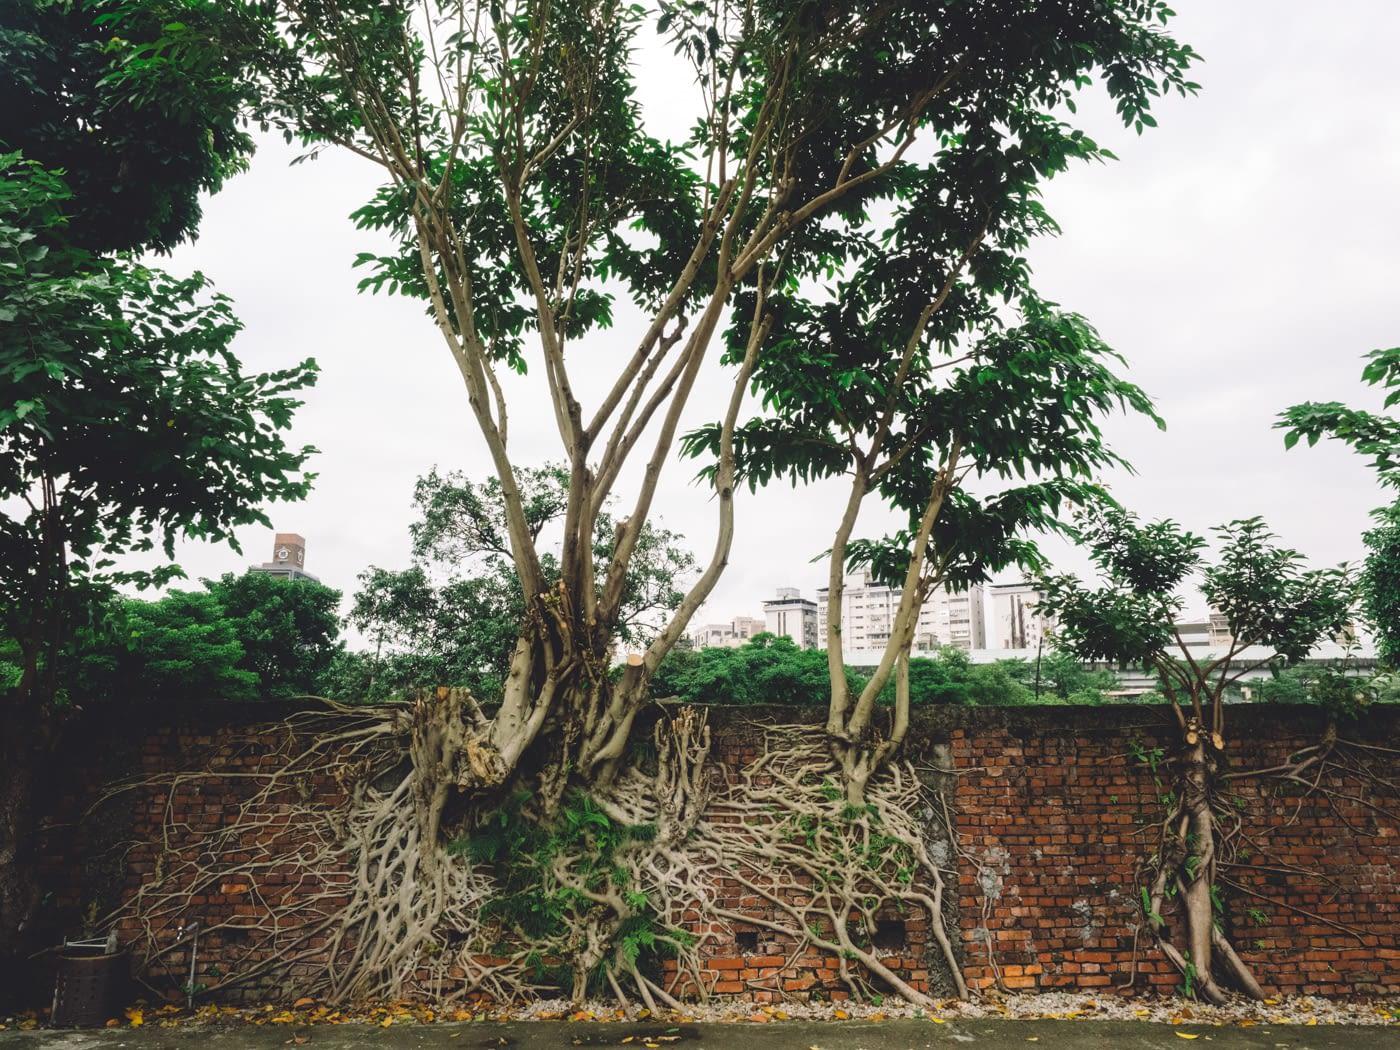 Taiwan - Huashan 1914 Creative Park - Tree roots through bricks